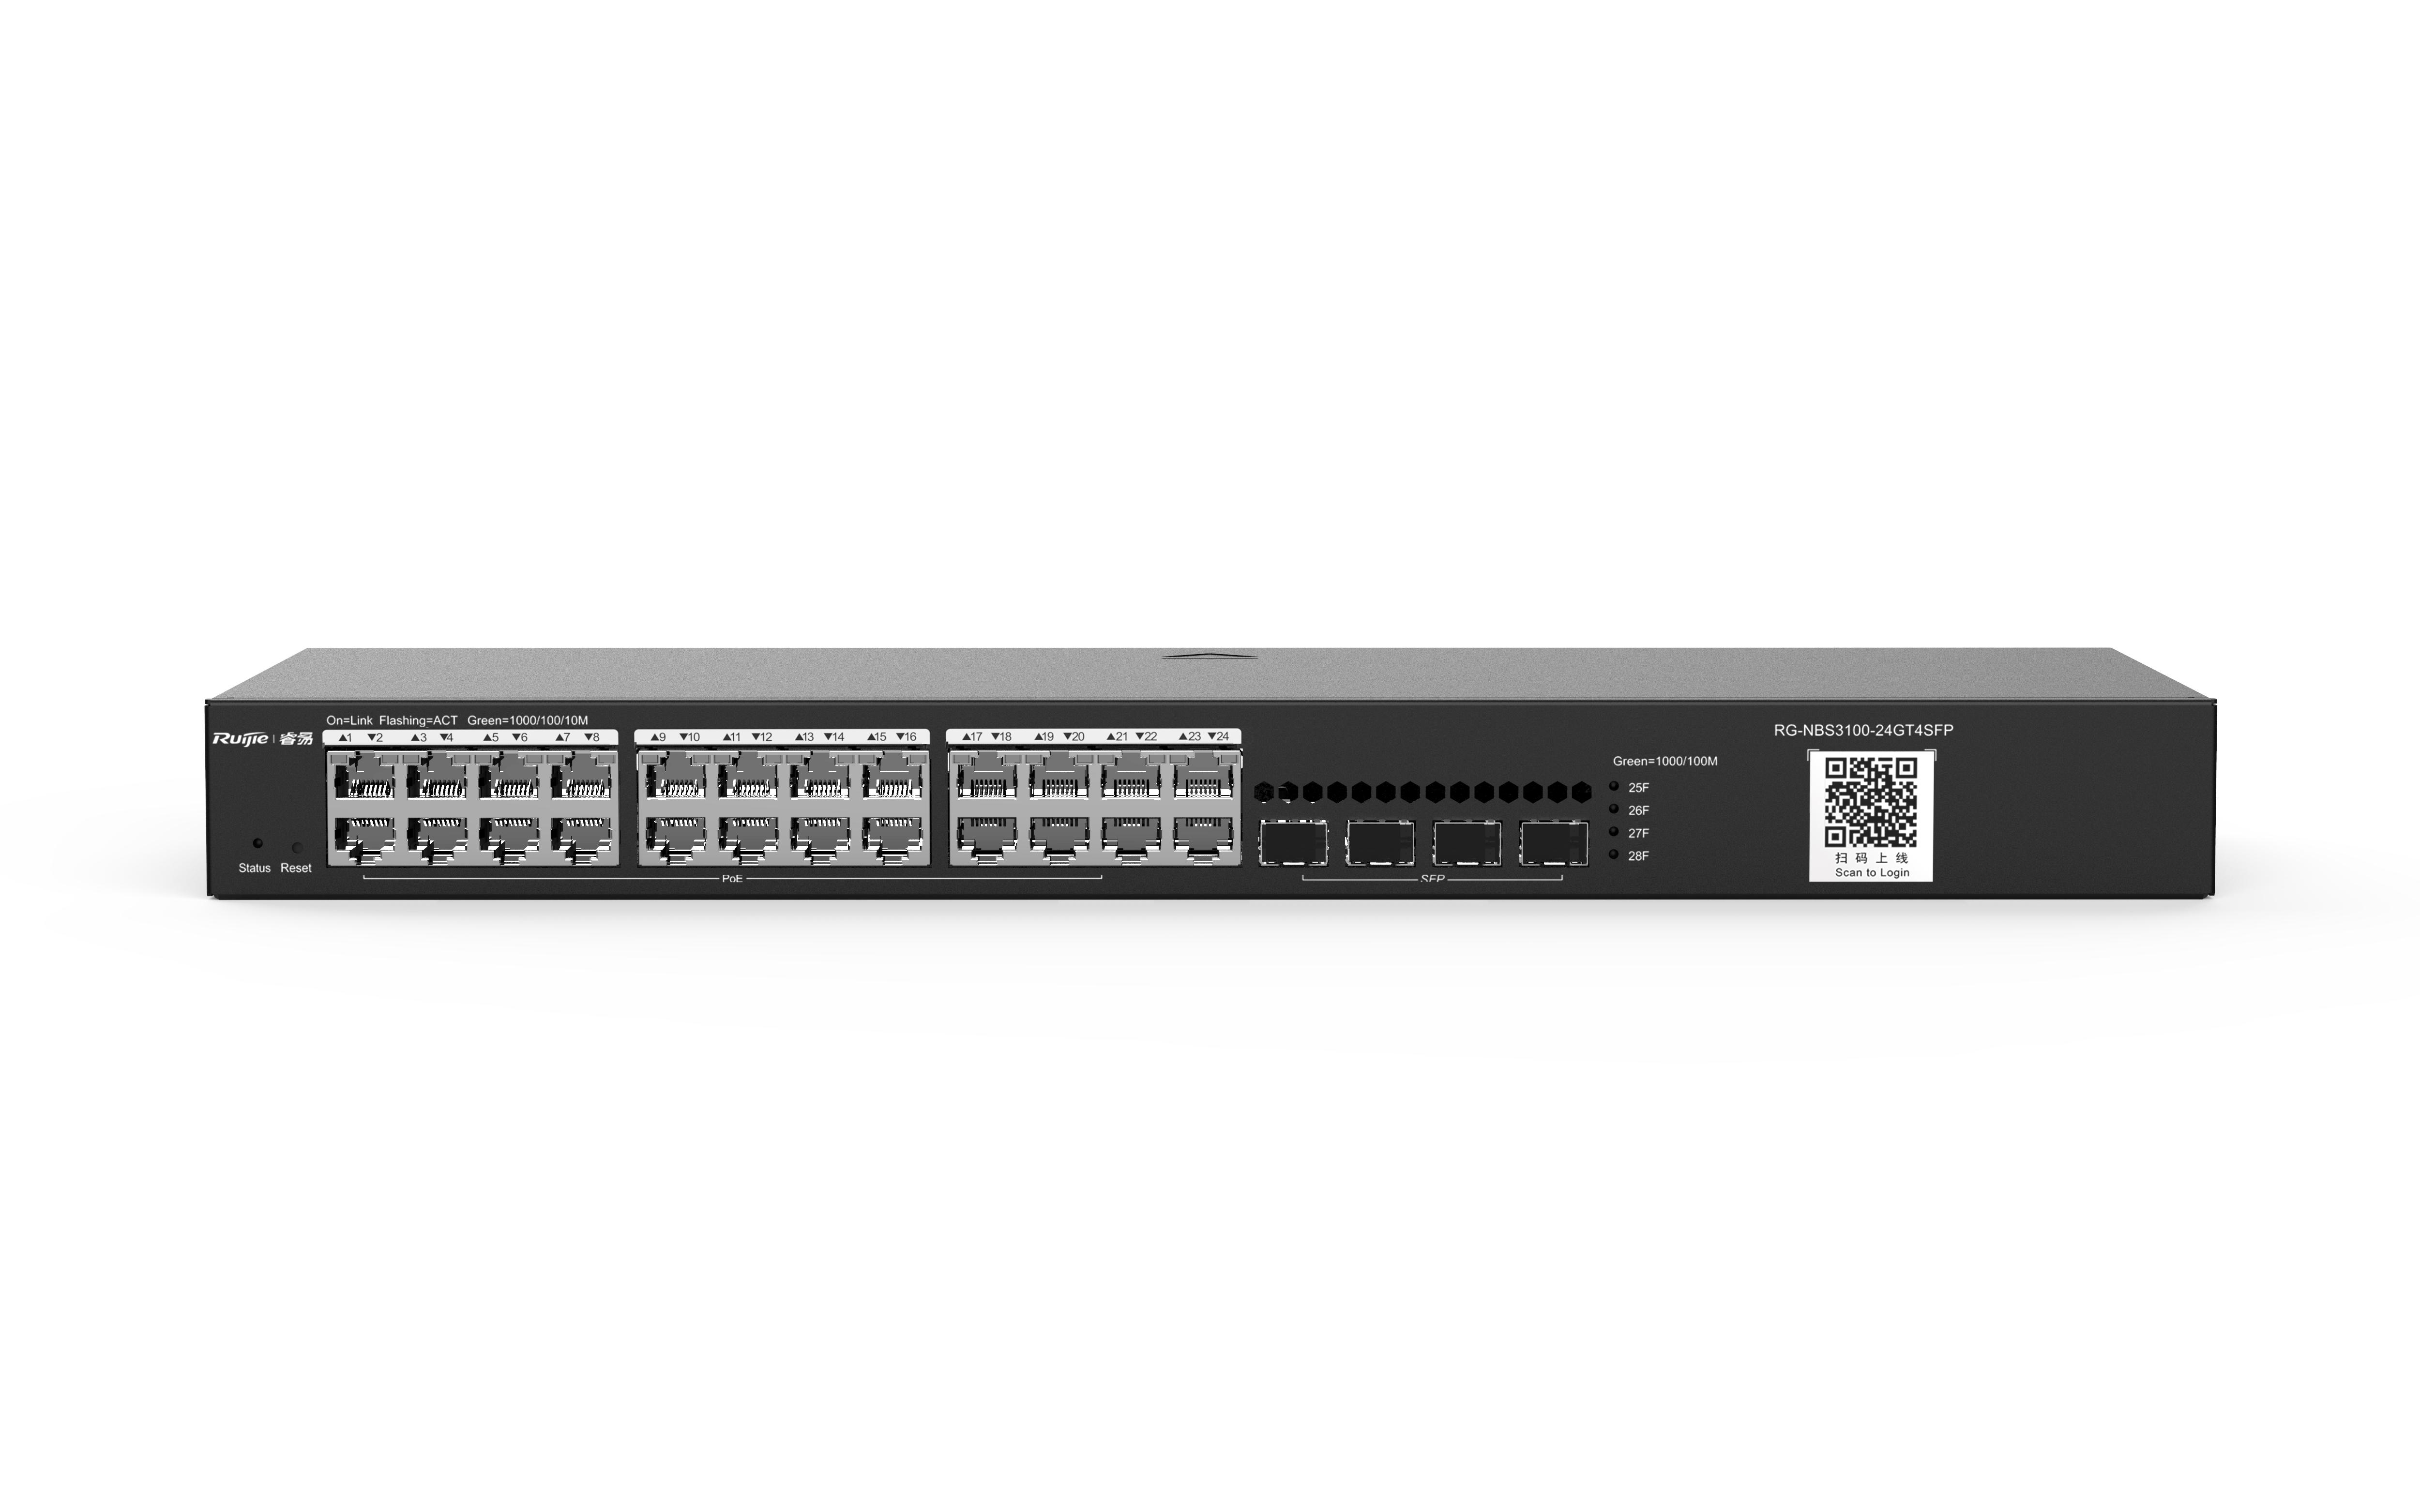 RG-NBS3100-24GT4SFP24口千兆接入千兆上联二层网管交换机